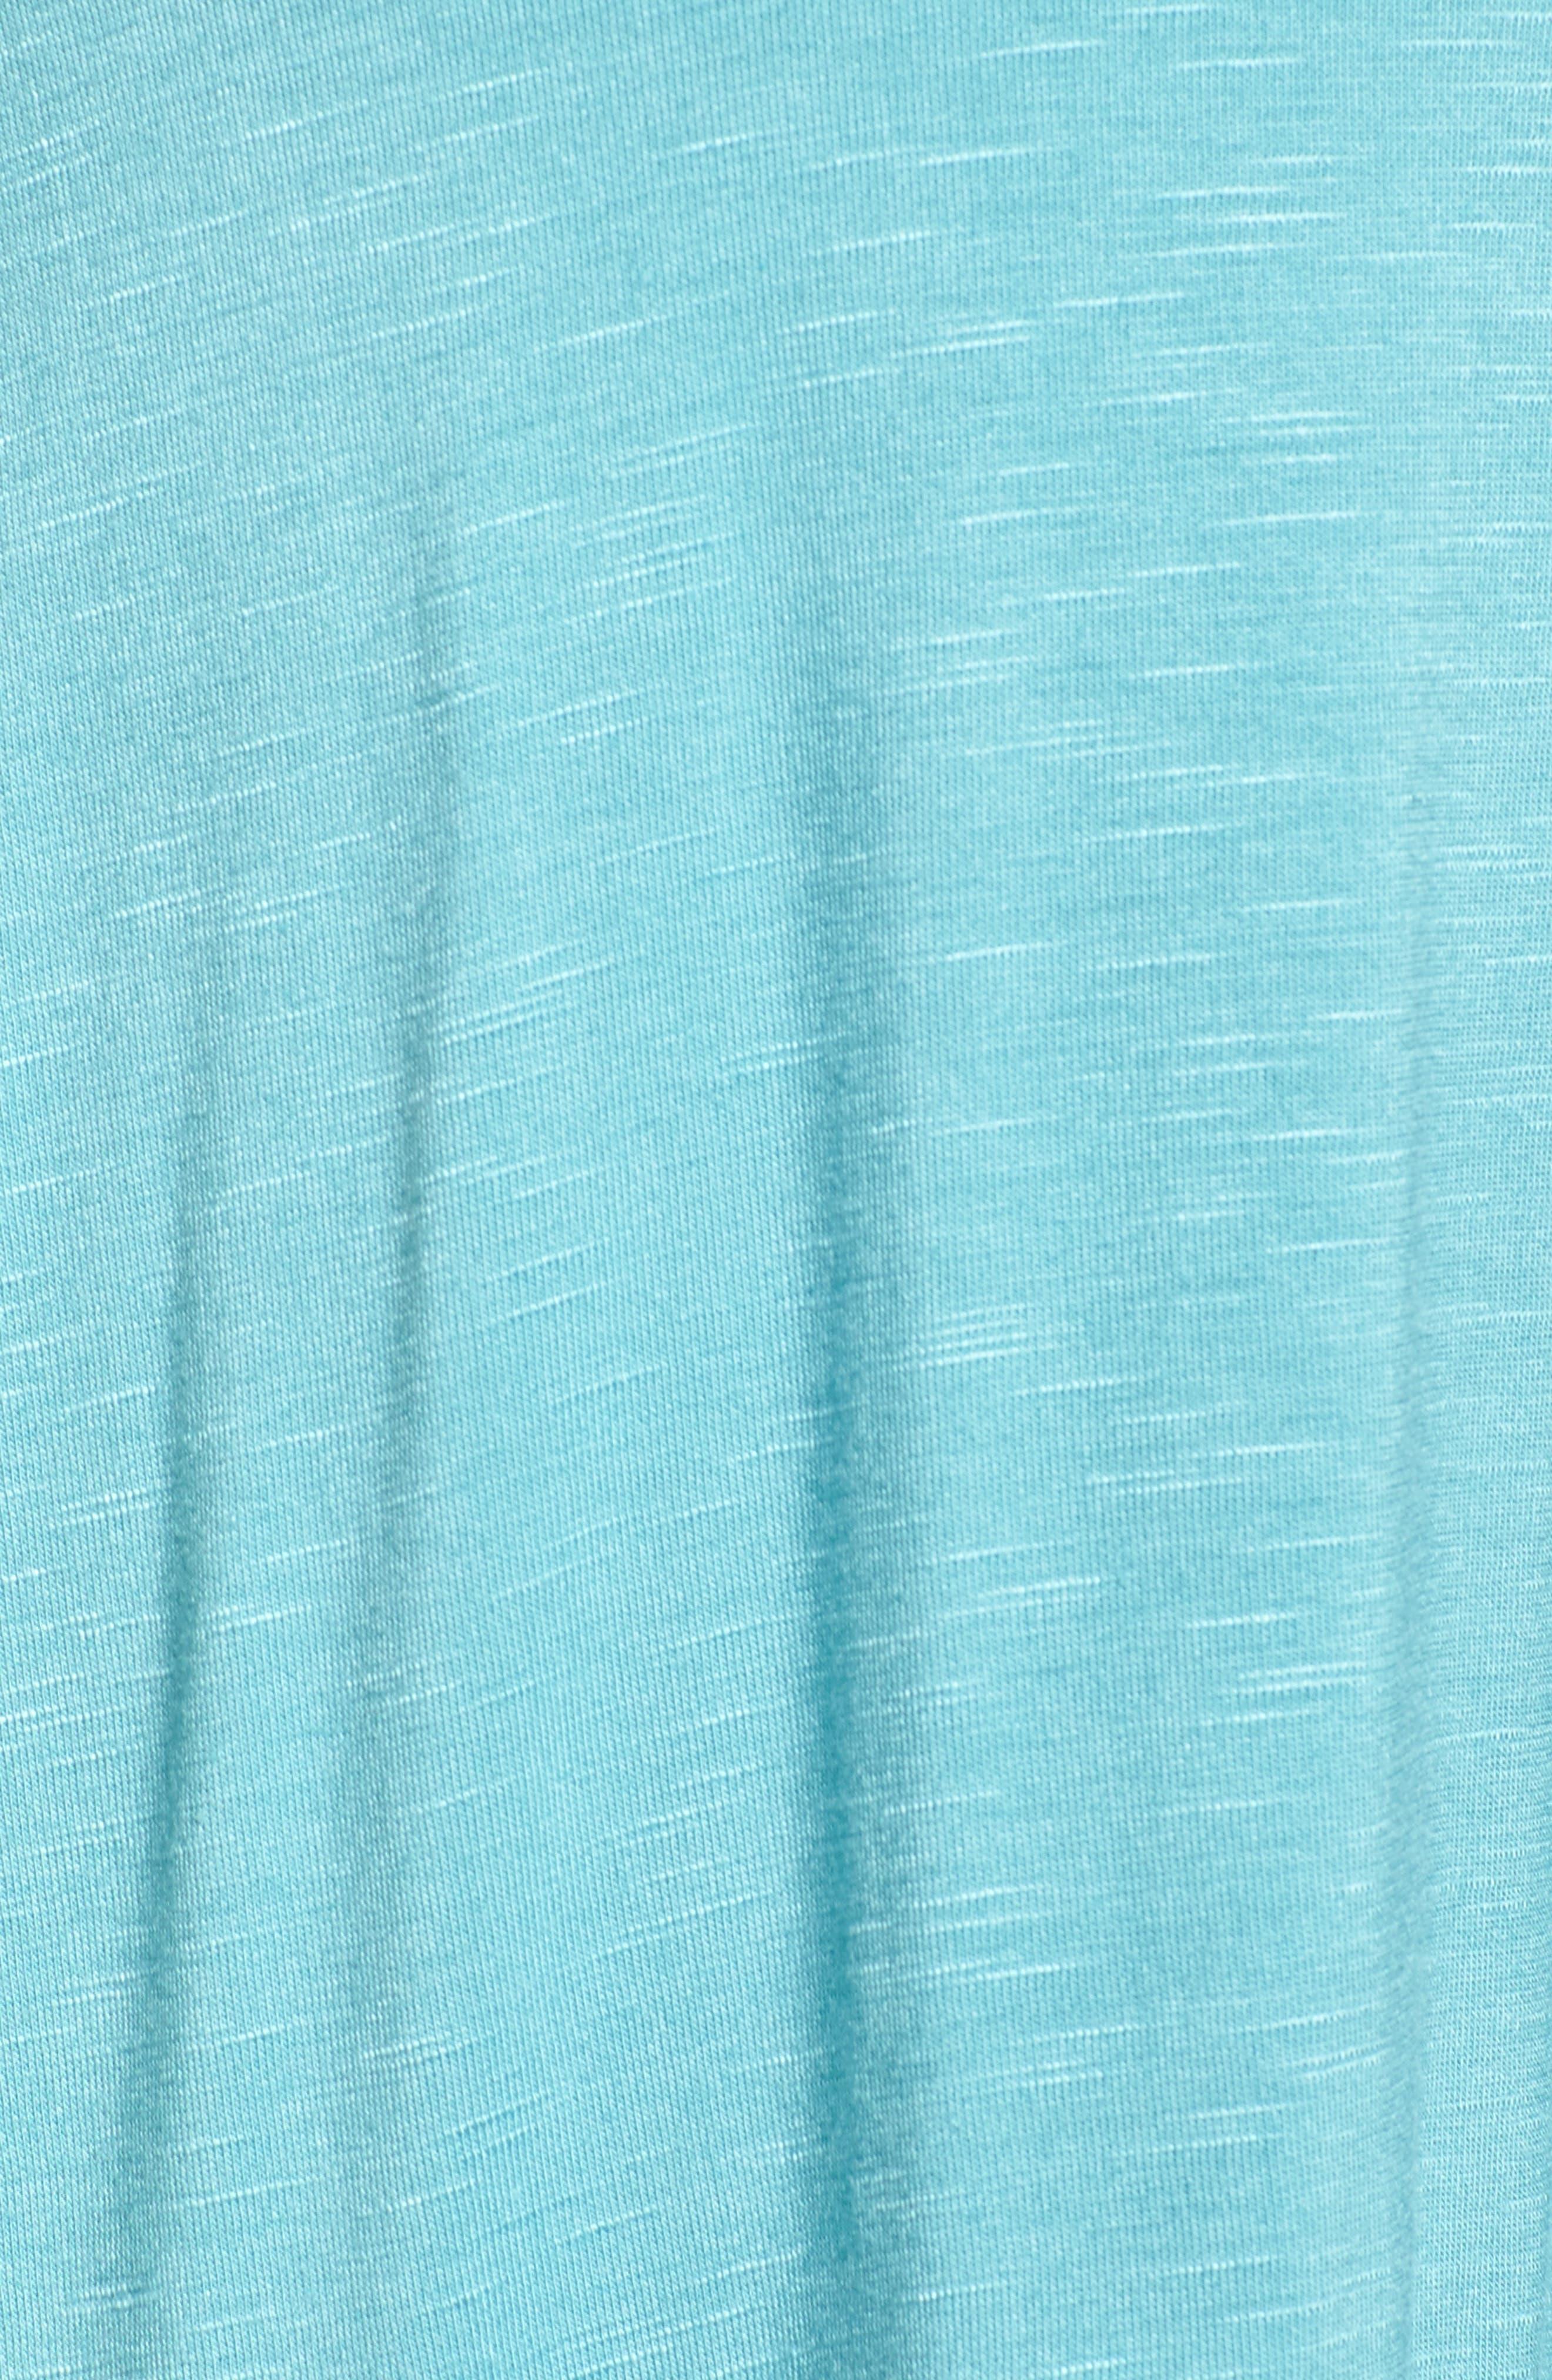 Ruffle Trim Tie Neck Top,                             Alternate thumbnail 5, color,                             440